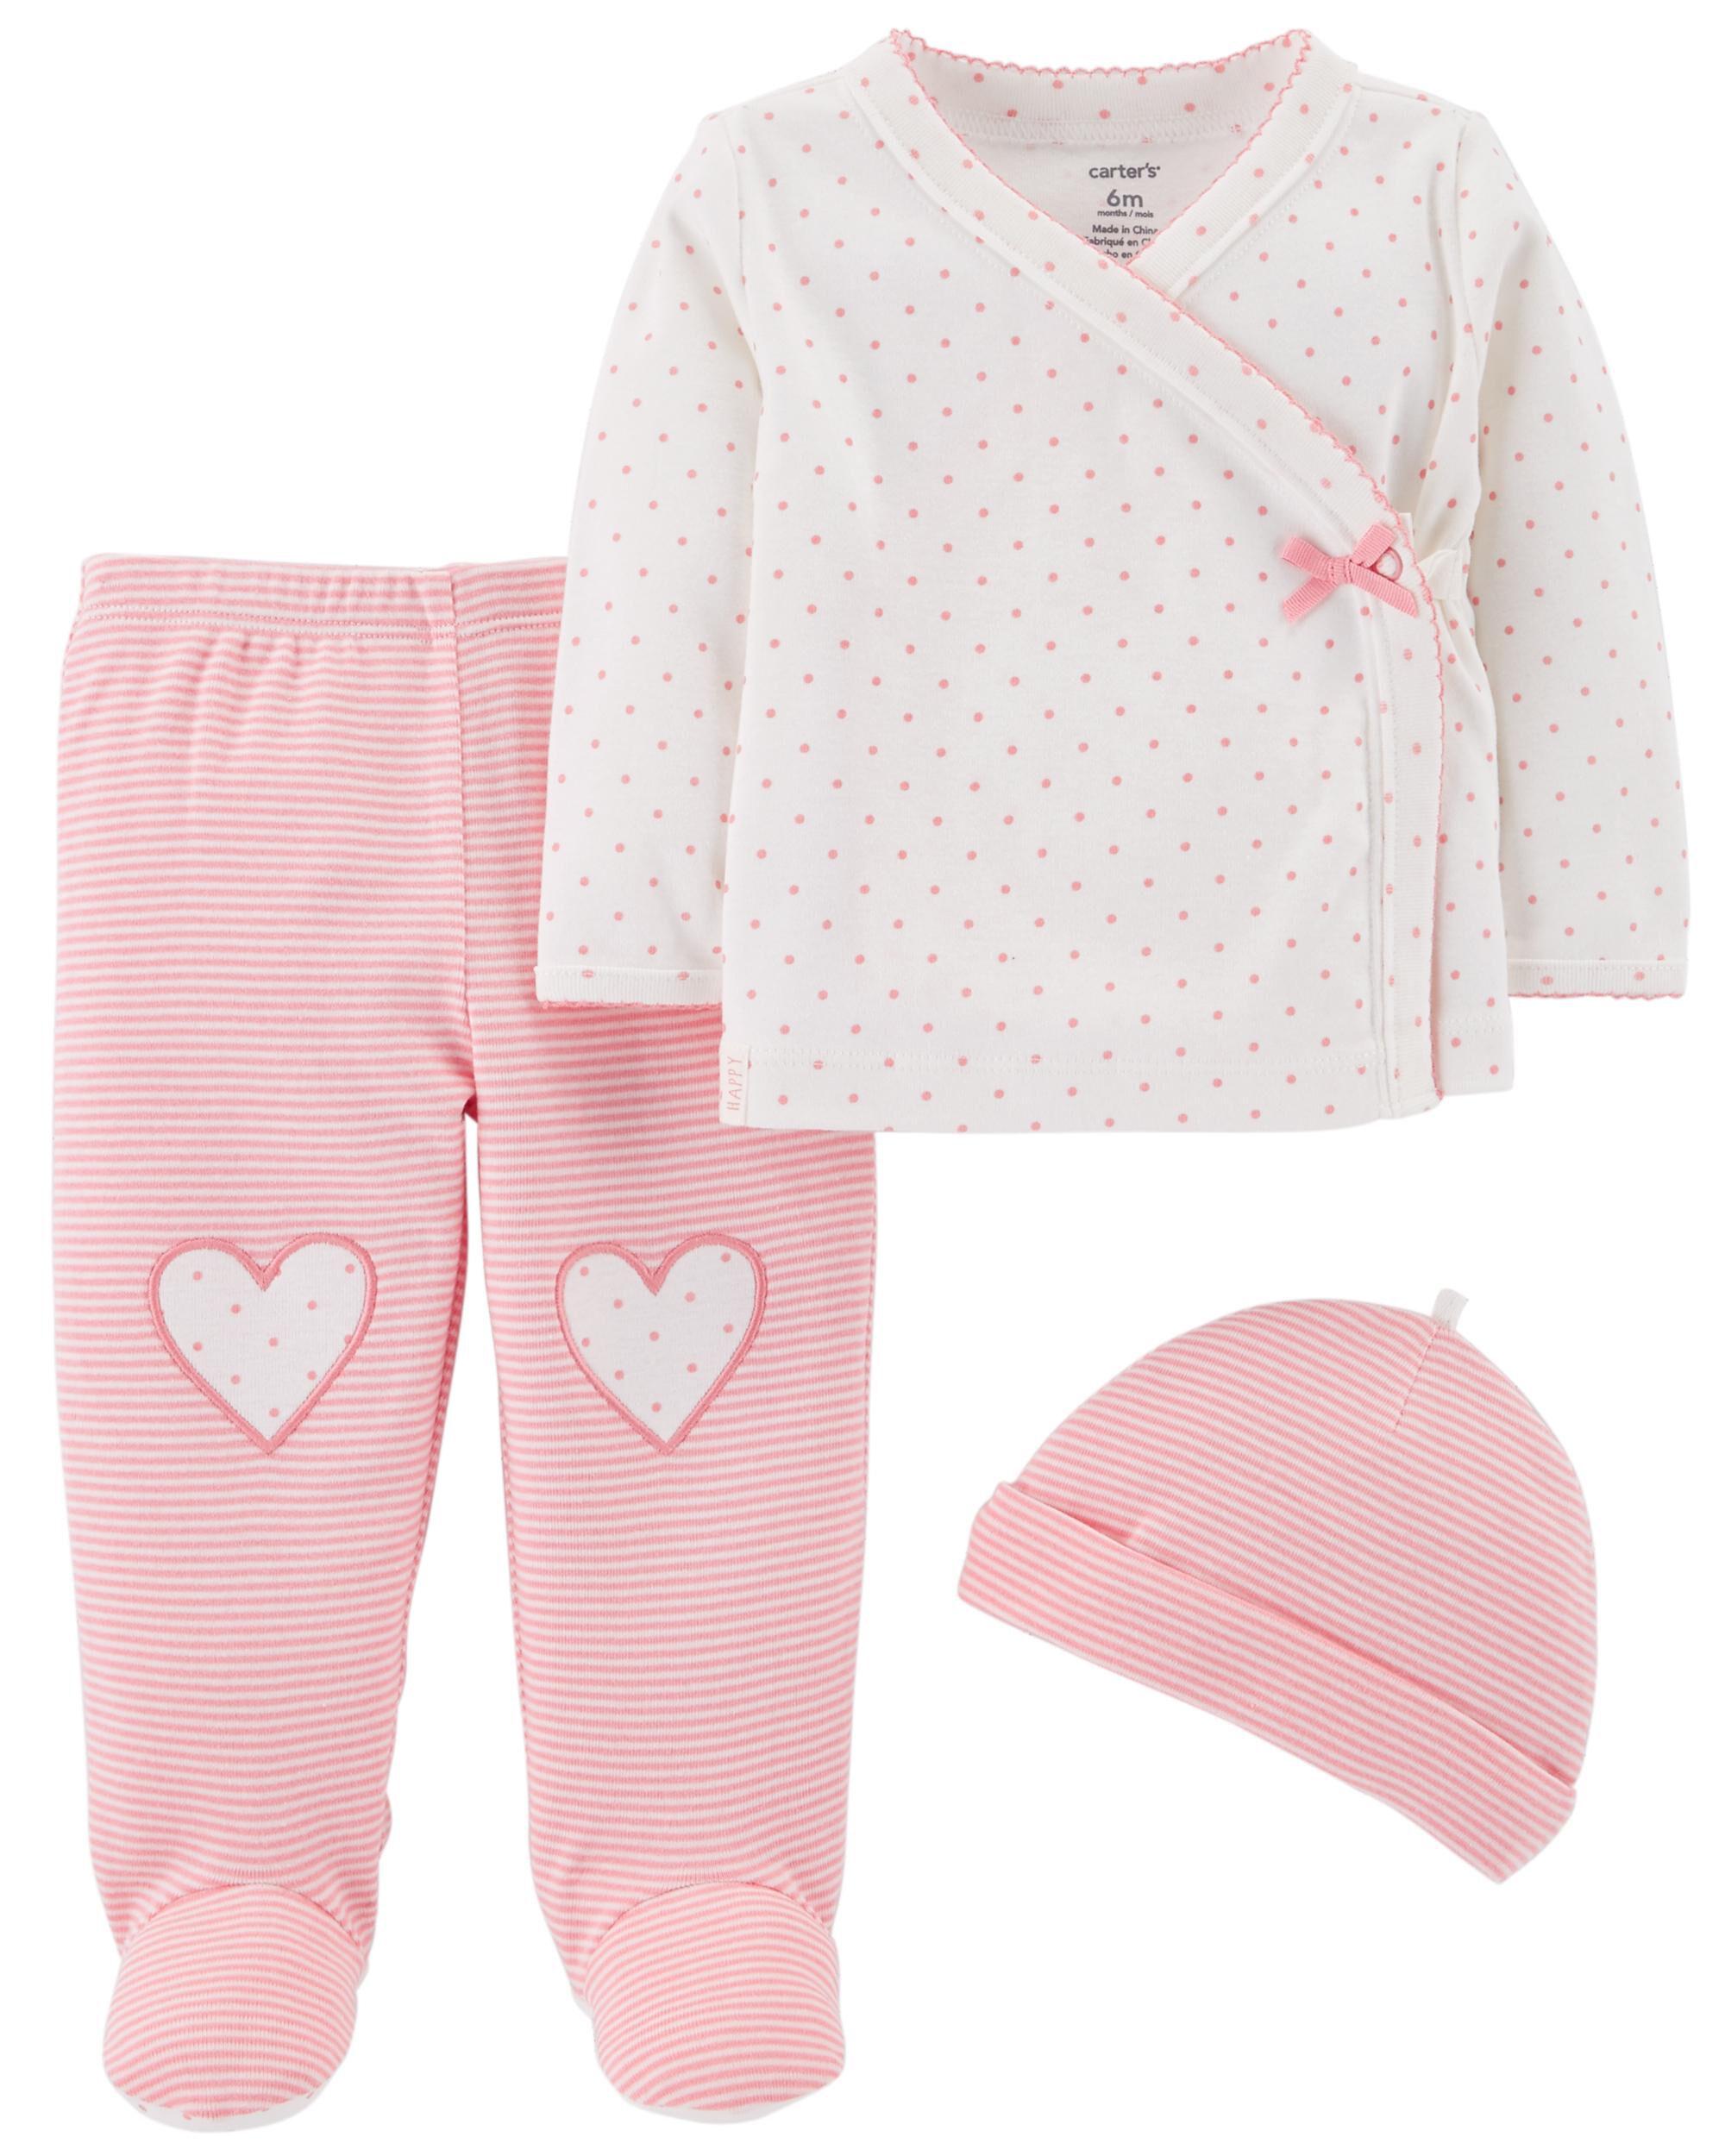 Sleepwear Hearty Nwt Baby Girl Carters 4 Piece Pj Set Size 18m